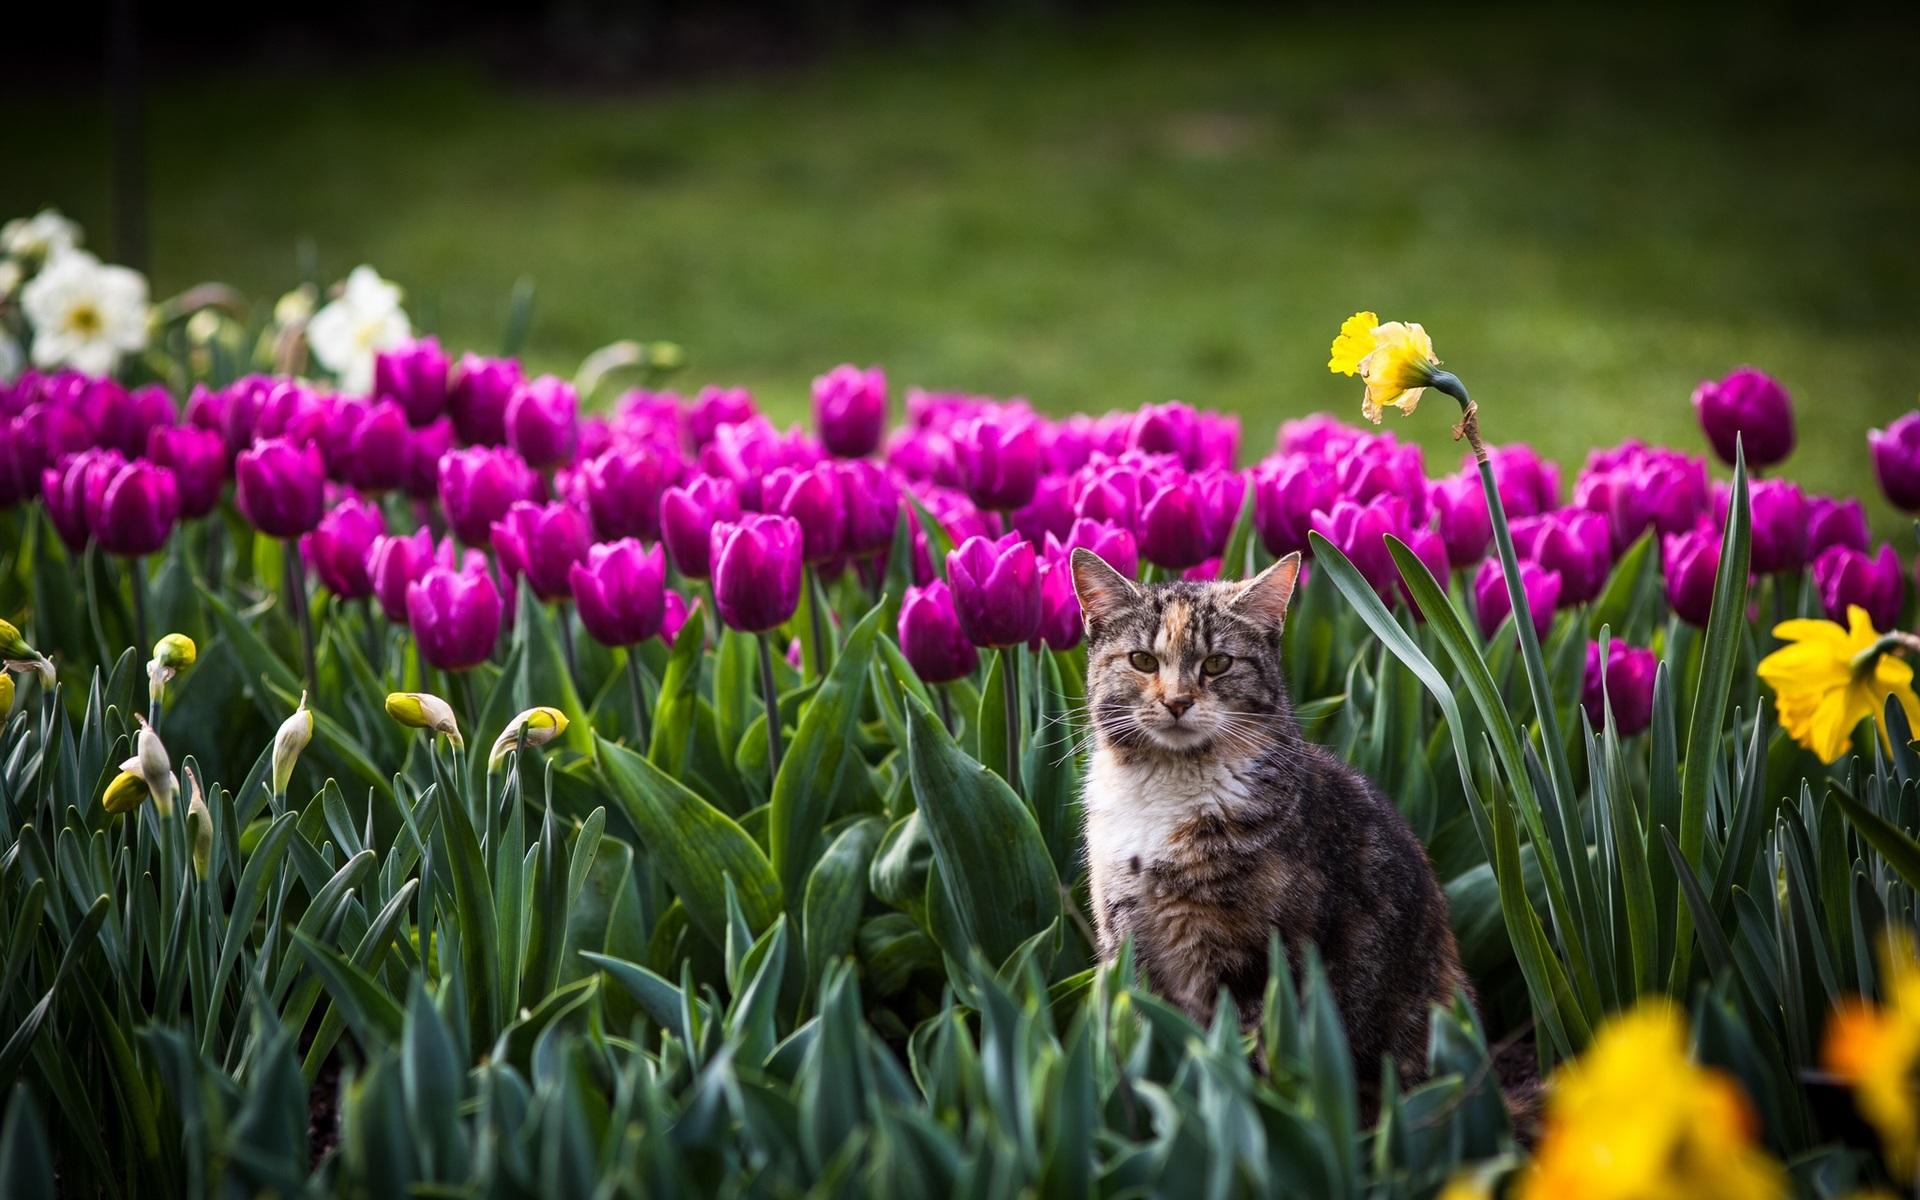 Cute Cat Wallpaper 3d Cat In The Flowers Field Tulip Bokeh Wallpaper Animals